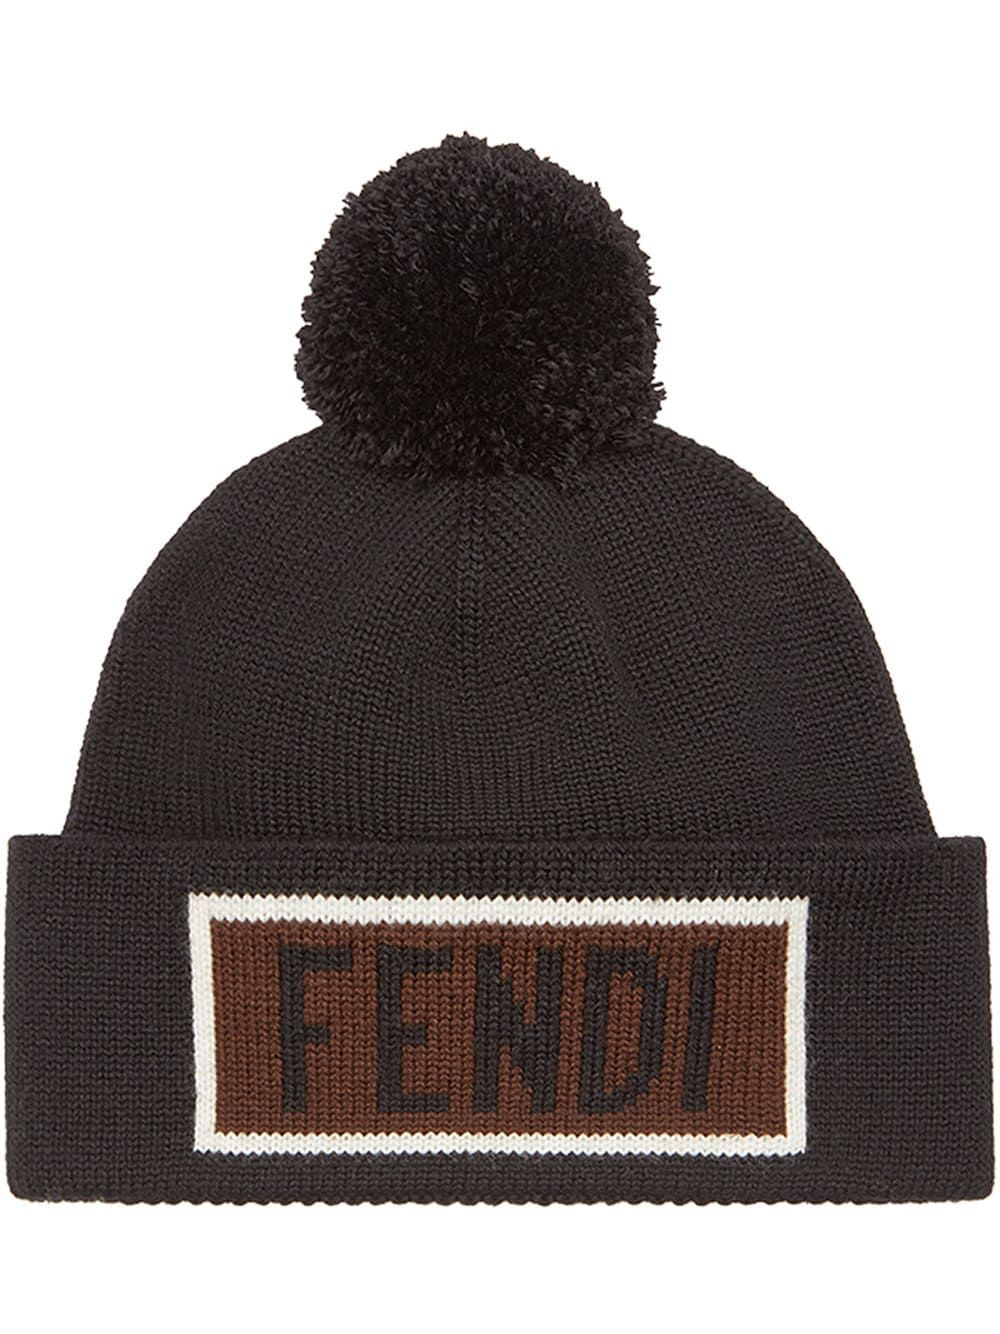 fendi  hat  logo  wool  pom-pom  black  men  style  fashion  winter ... 611c810d2f3